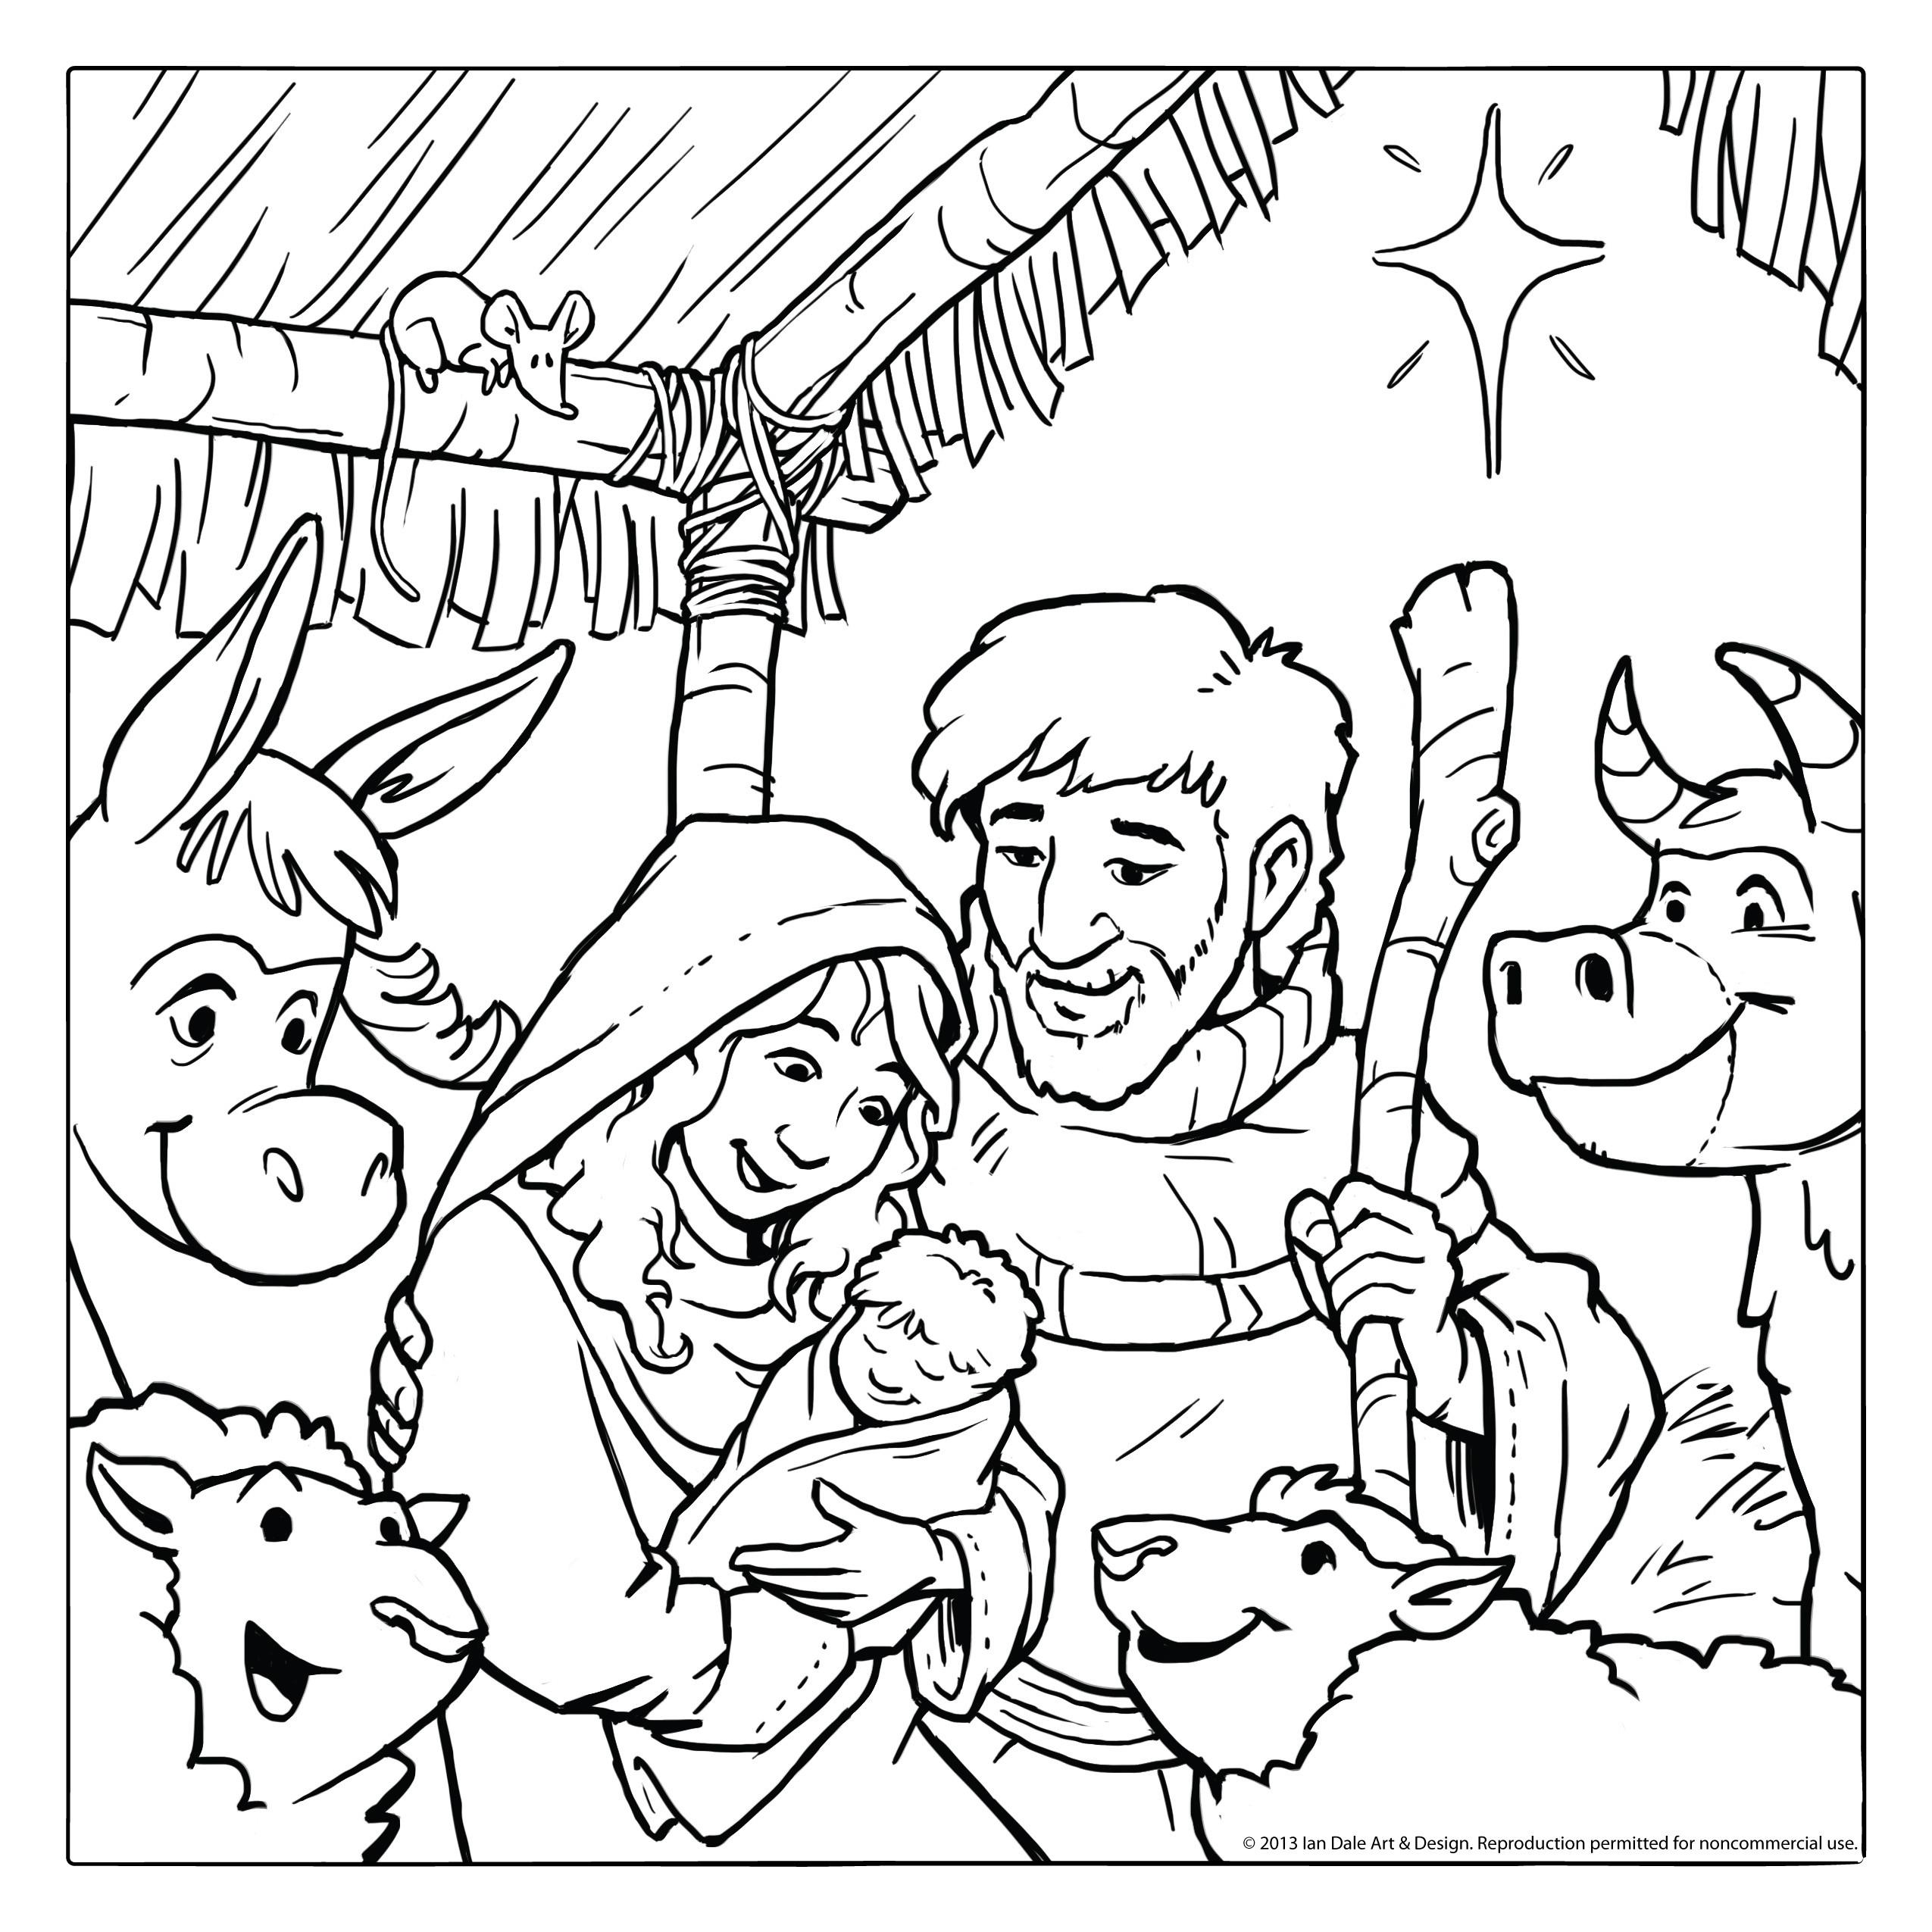 2550x2550 Imagenes De Navidad Infantiles Para Colorear Belen Lovely